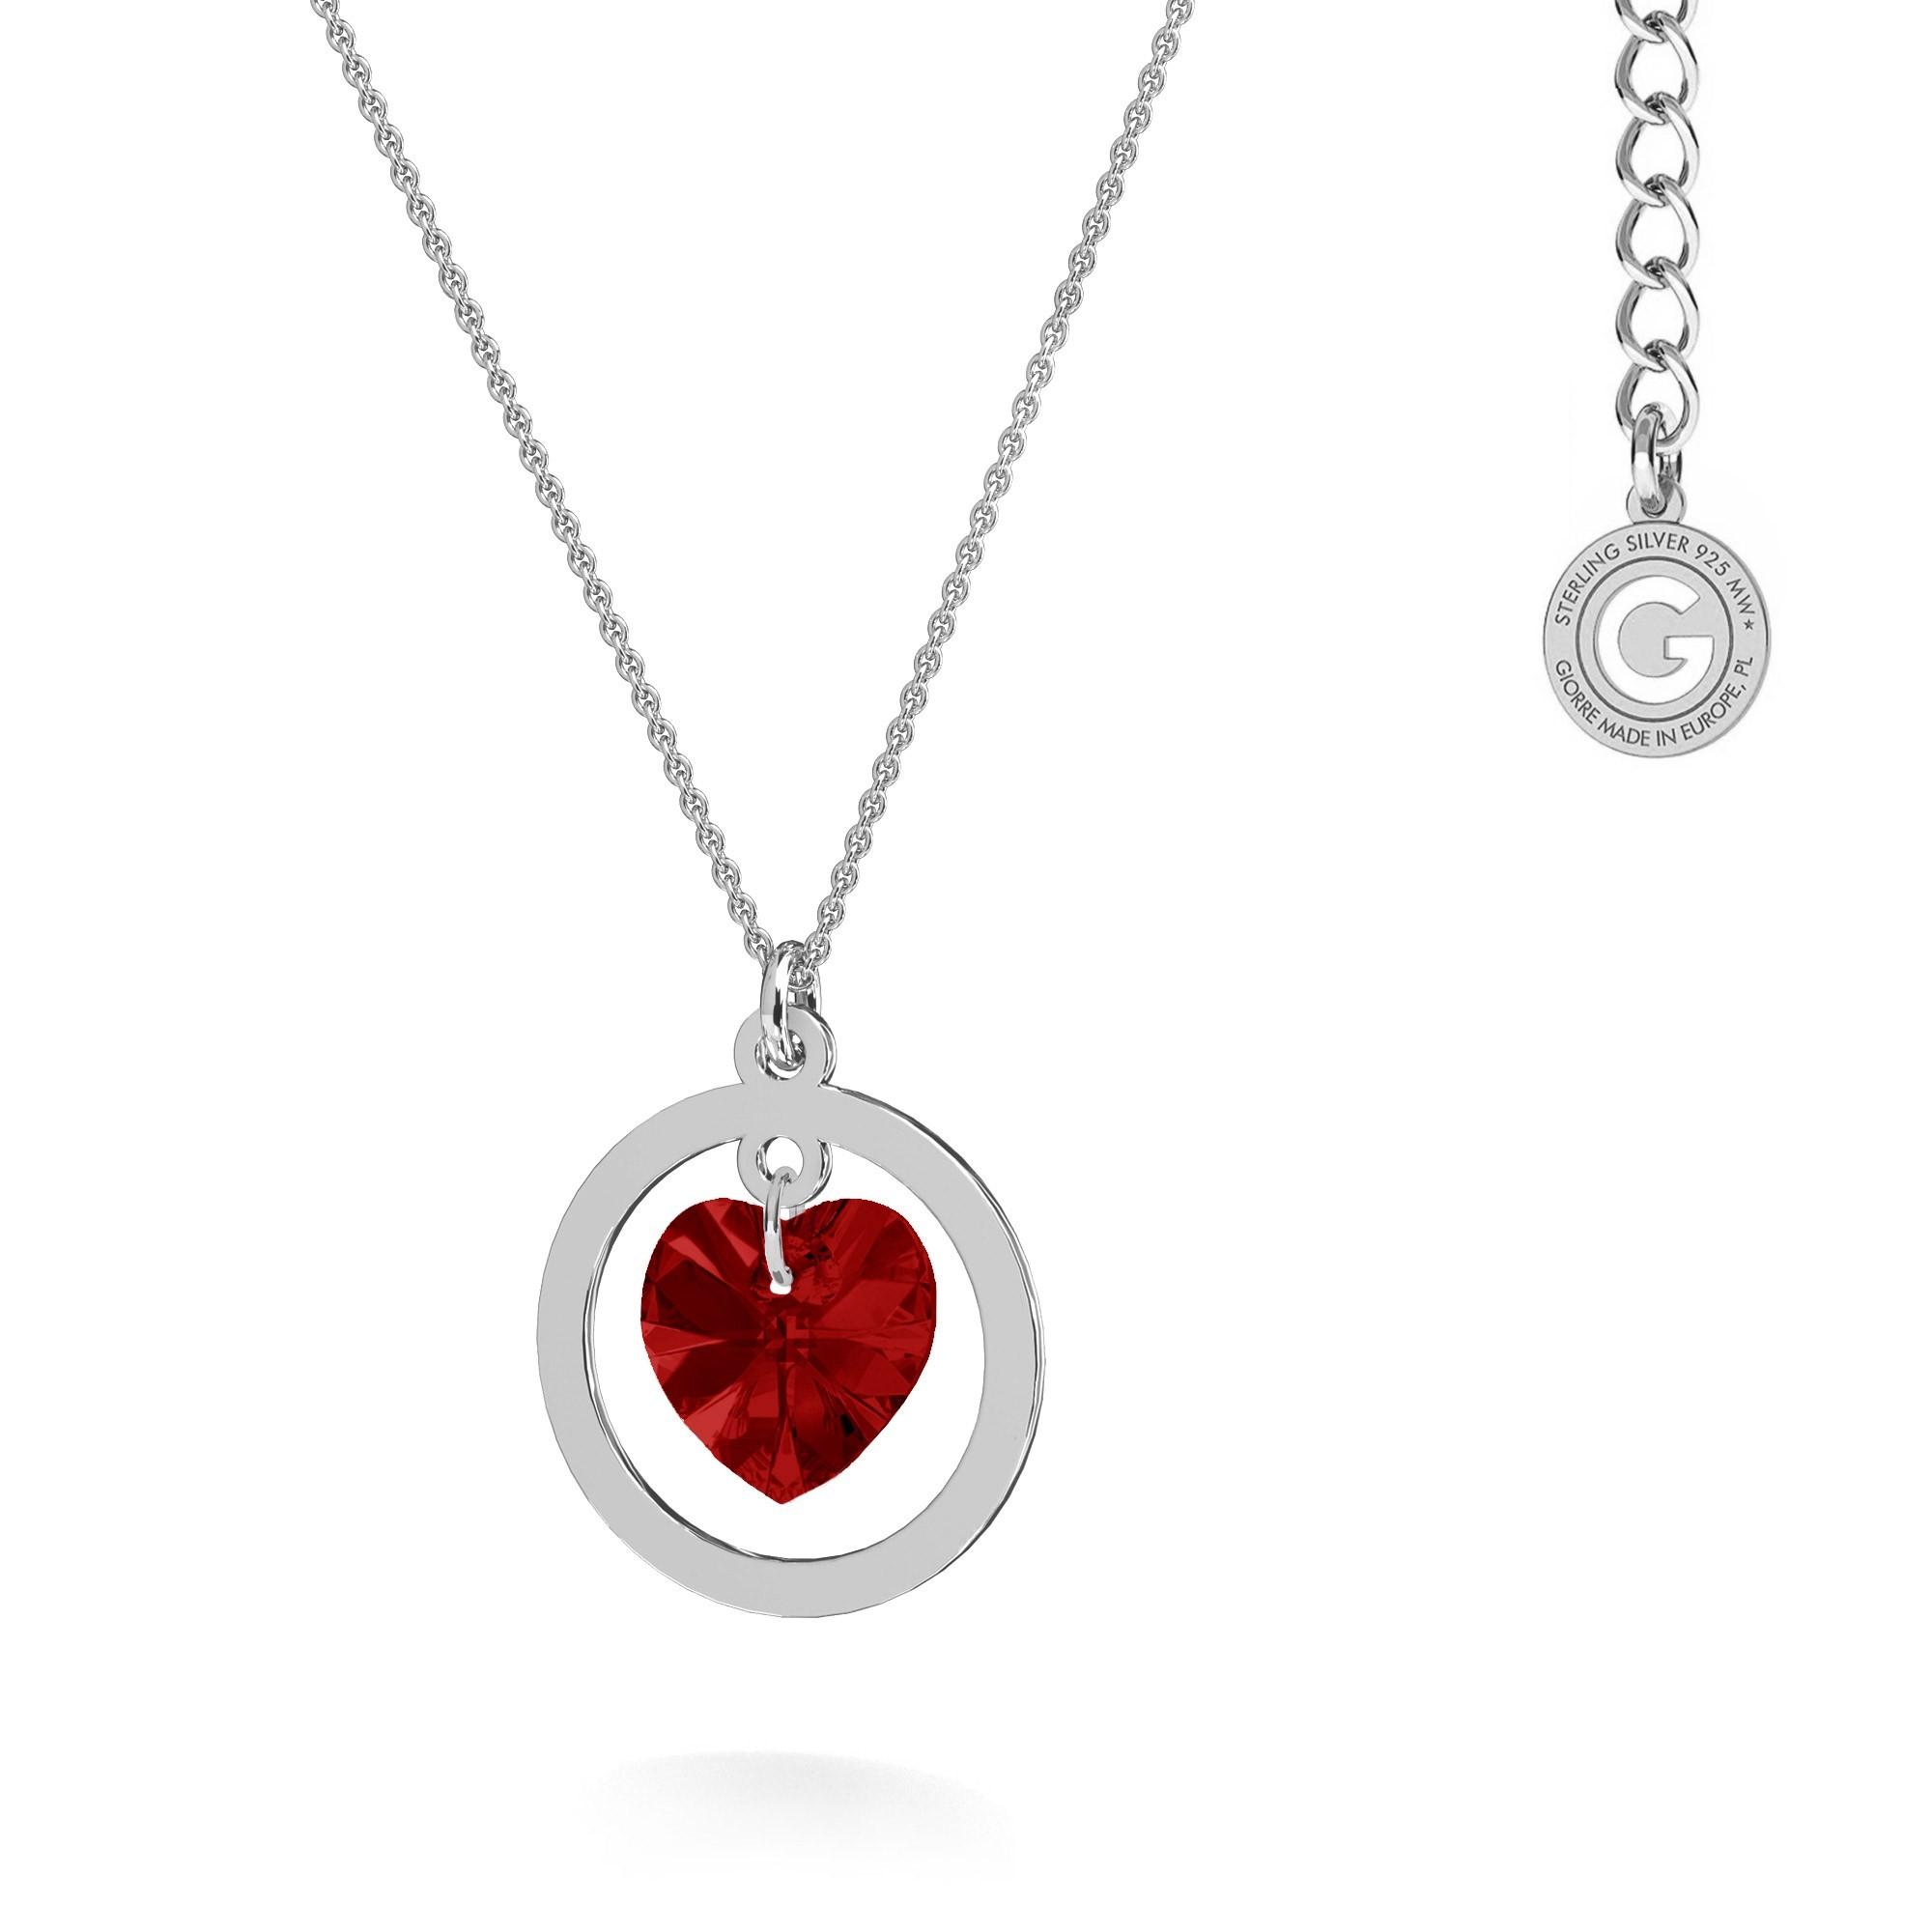 Crystal pendant necklace MON DÉFI, engraving, Swarovski, silver 925